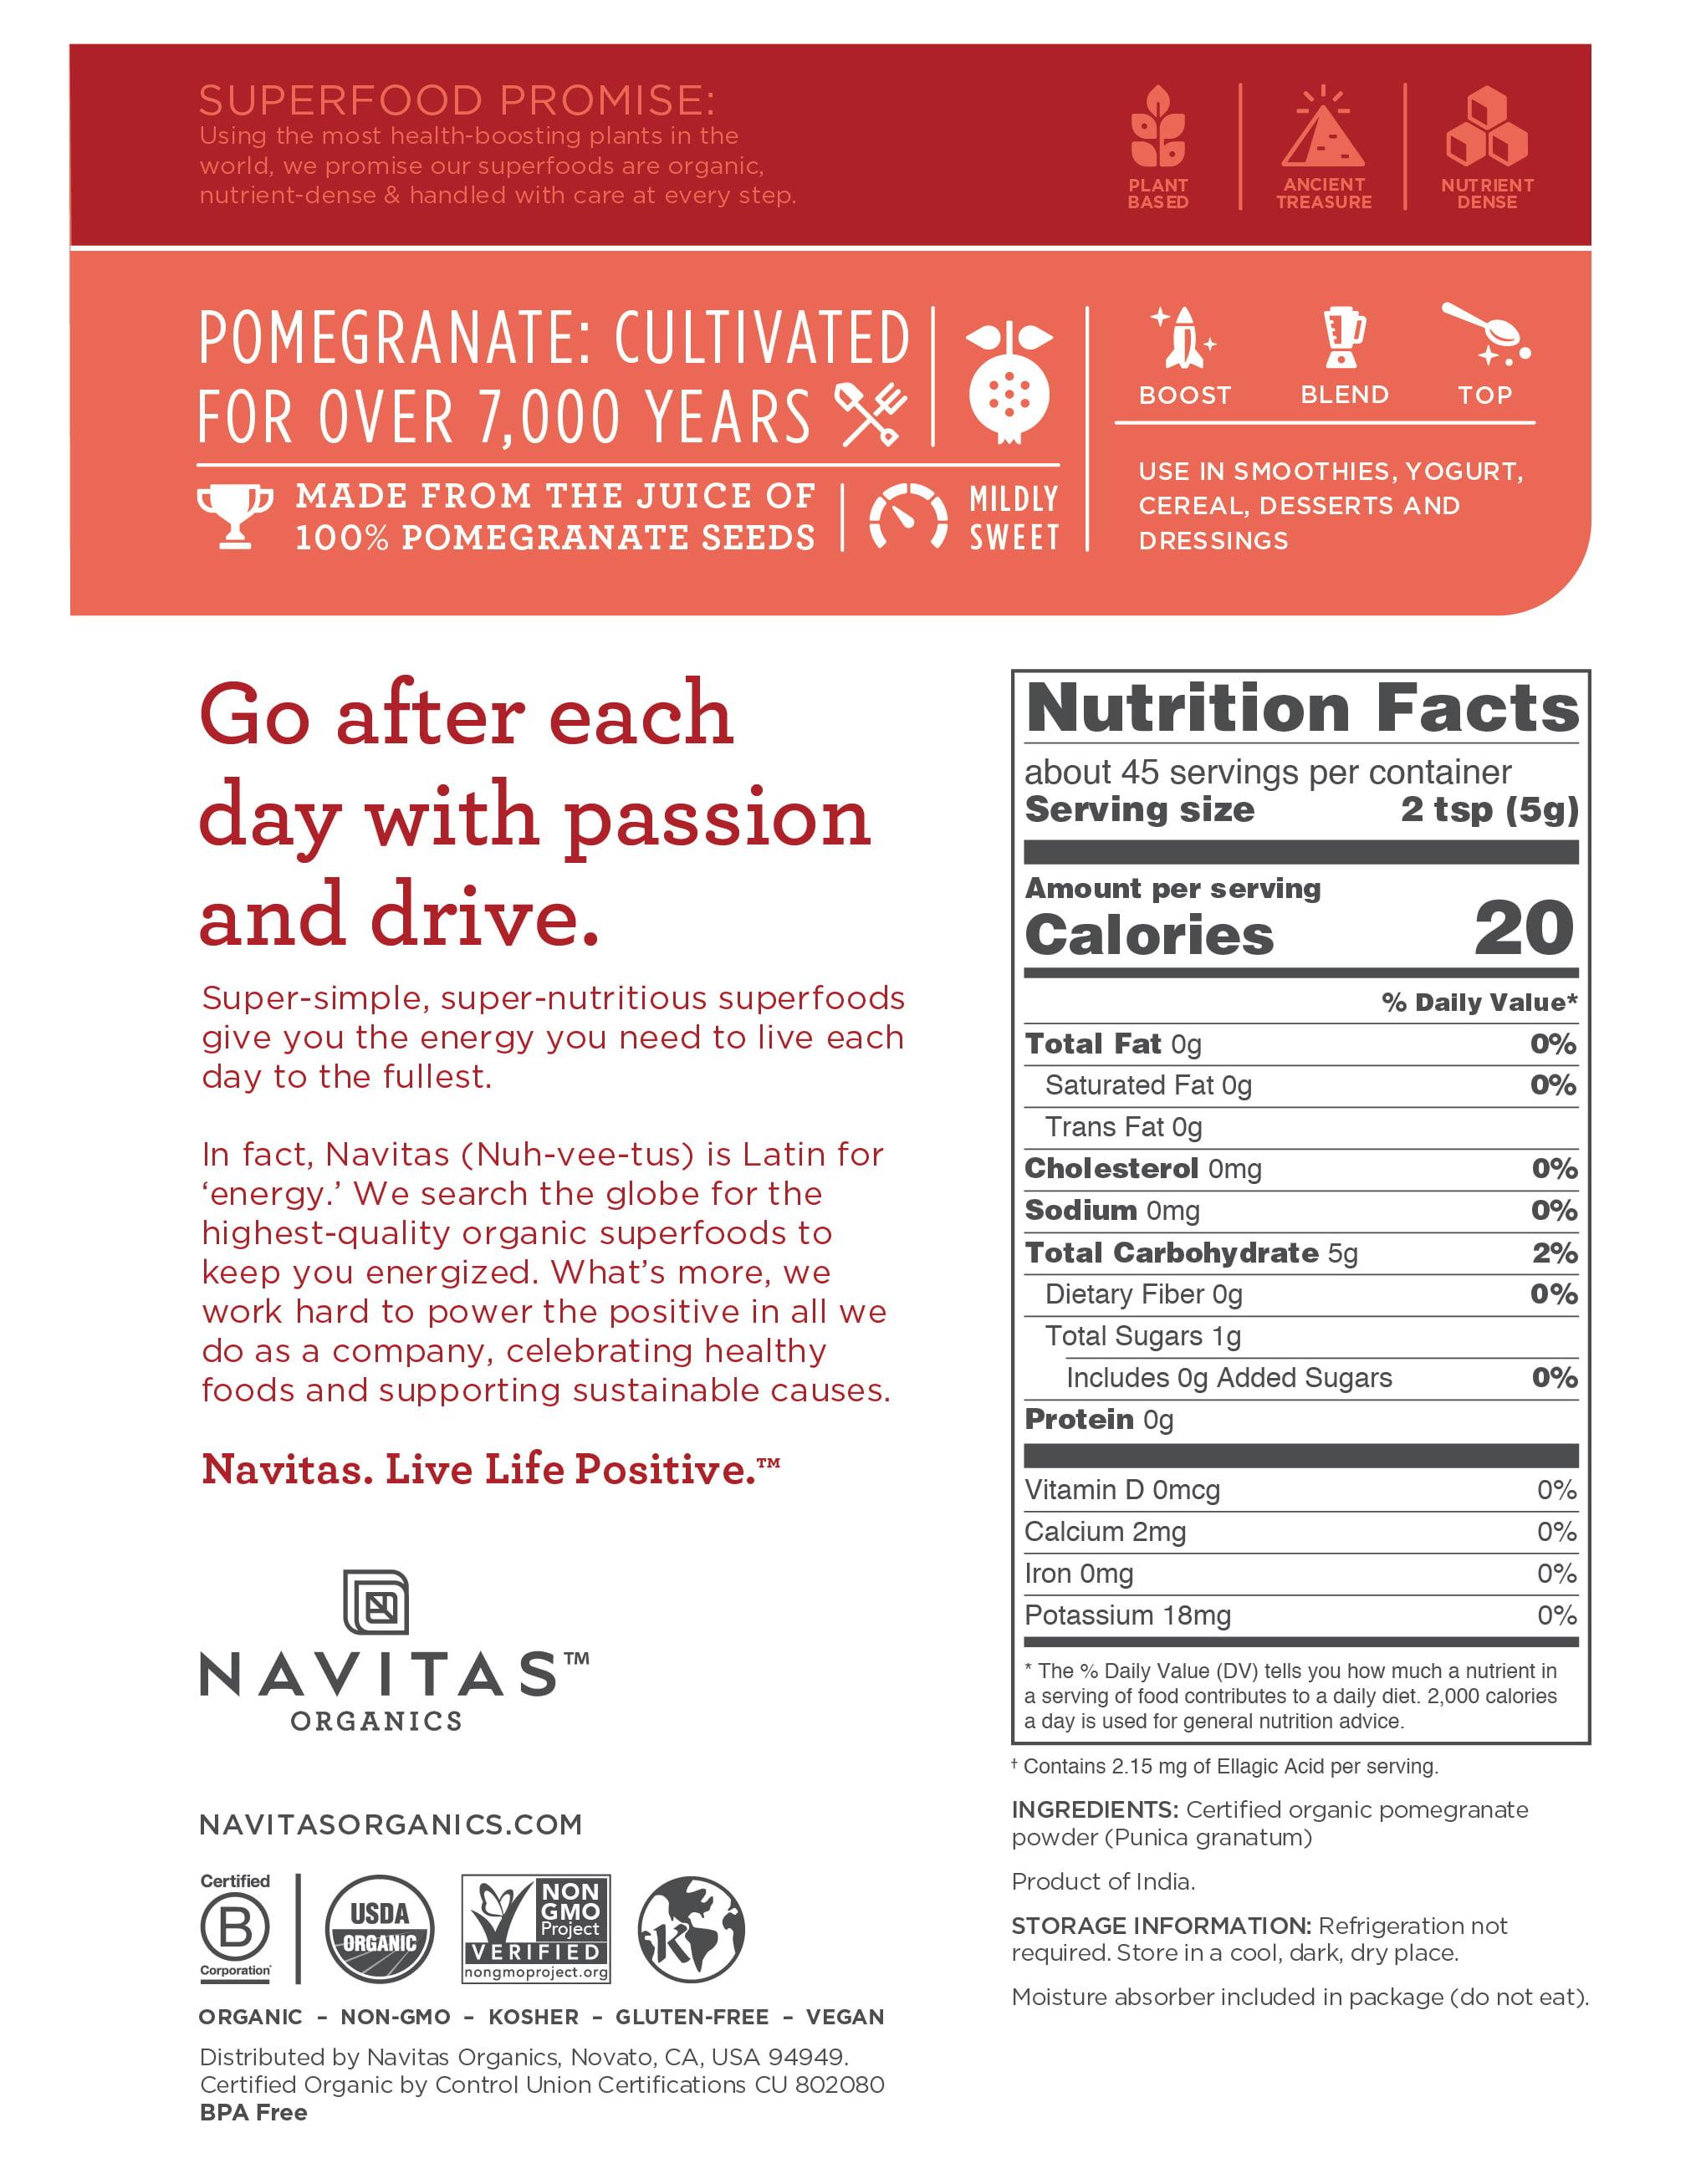 Navitas Organics Pomegranate Powder, 8 oz